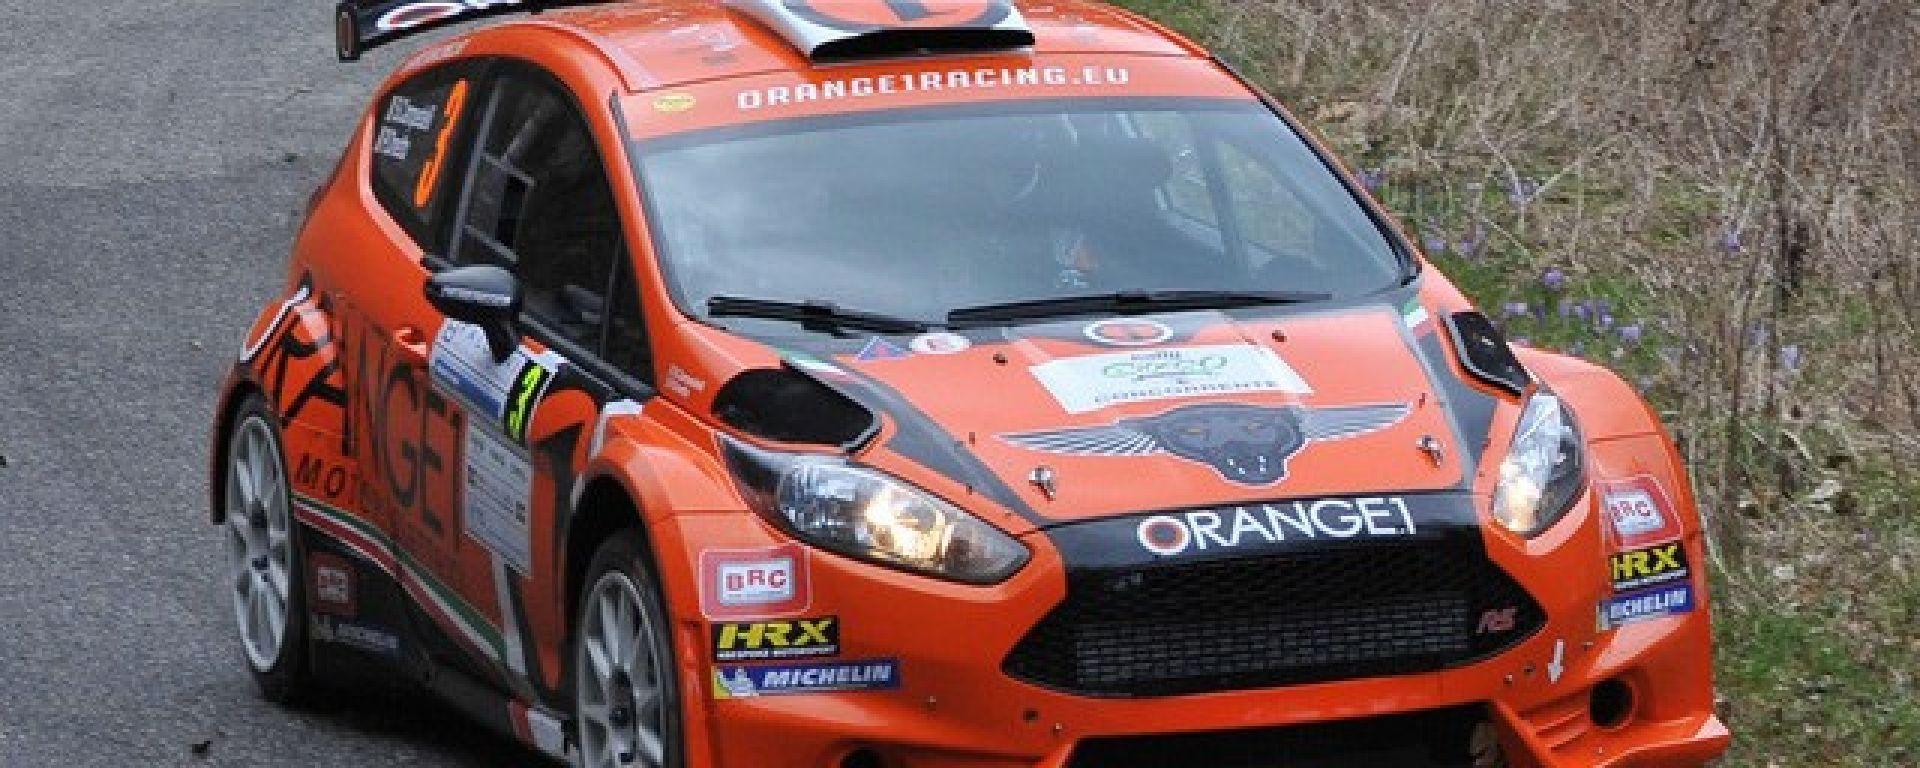 Simone Campedelli Ford Fiesta R5 team Orange1